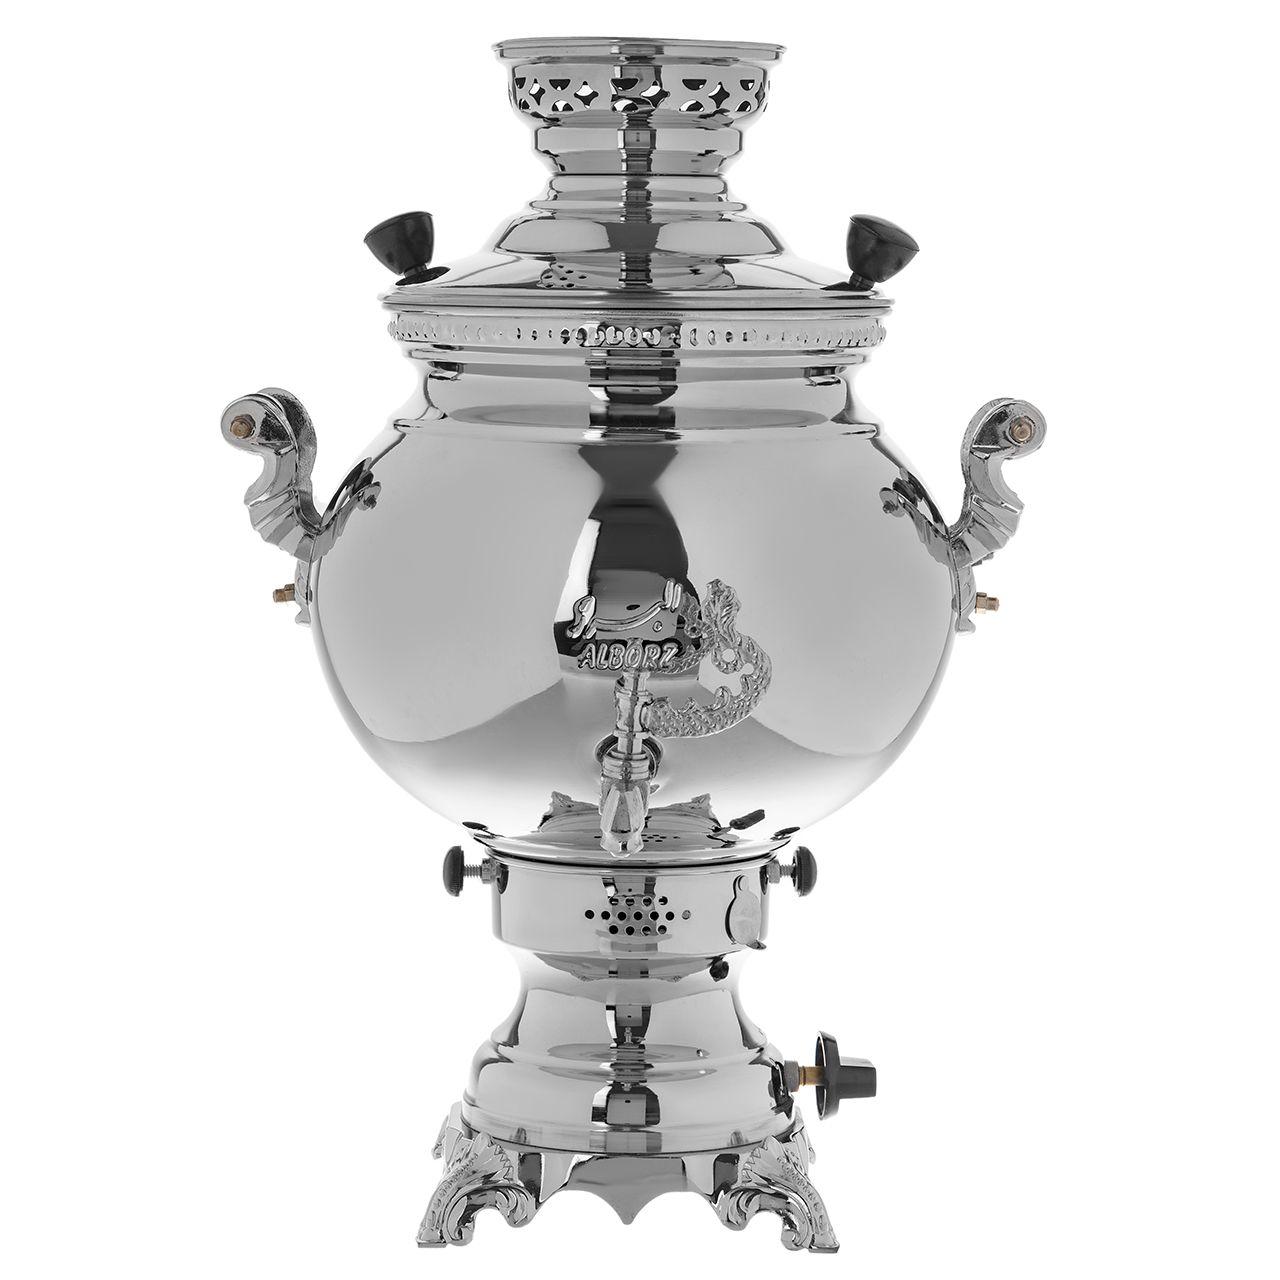 سماور گازسوز البرز مدل صدفی ظرفیت 8 لیتر